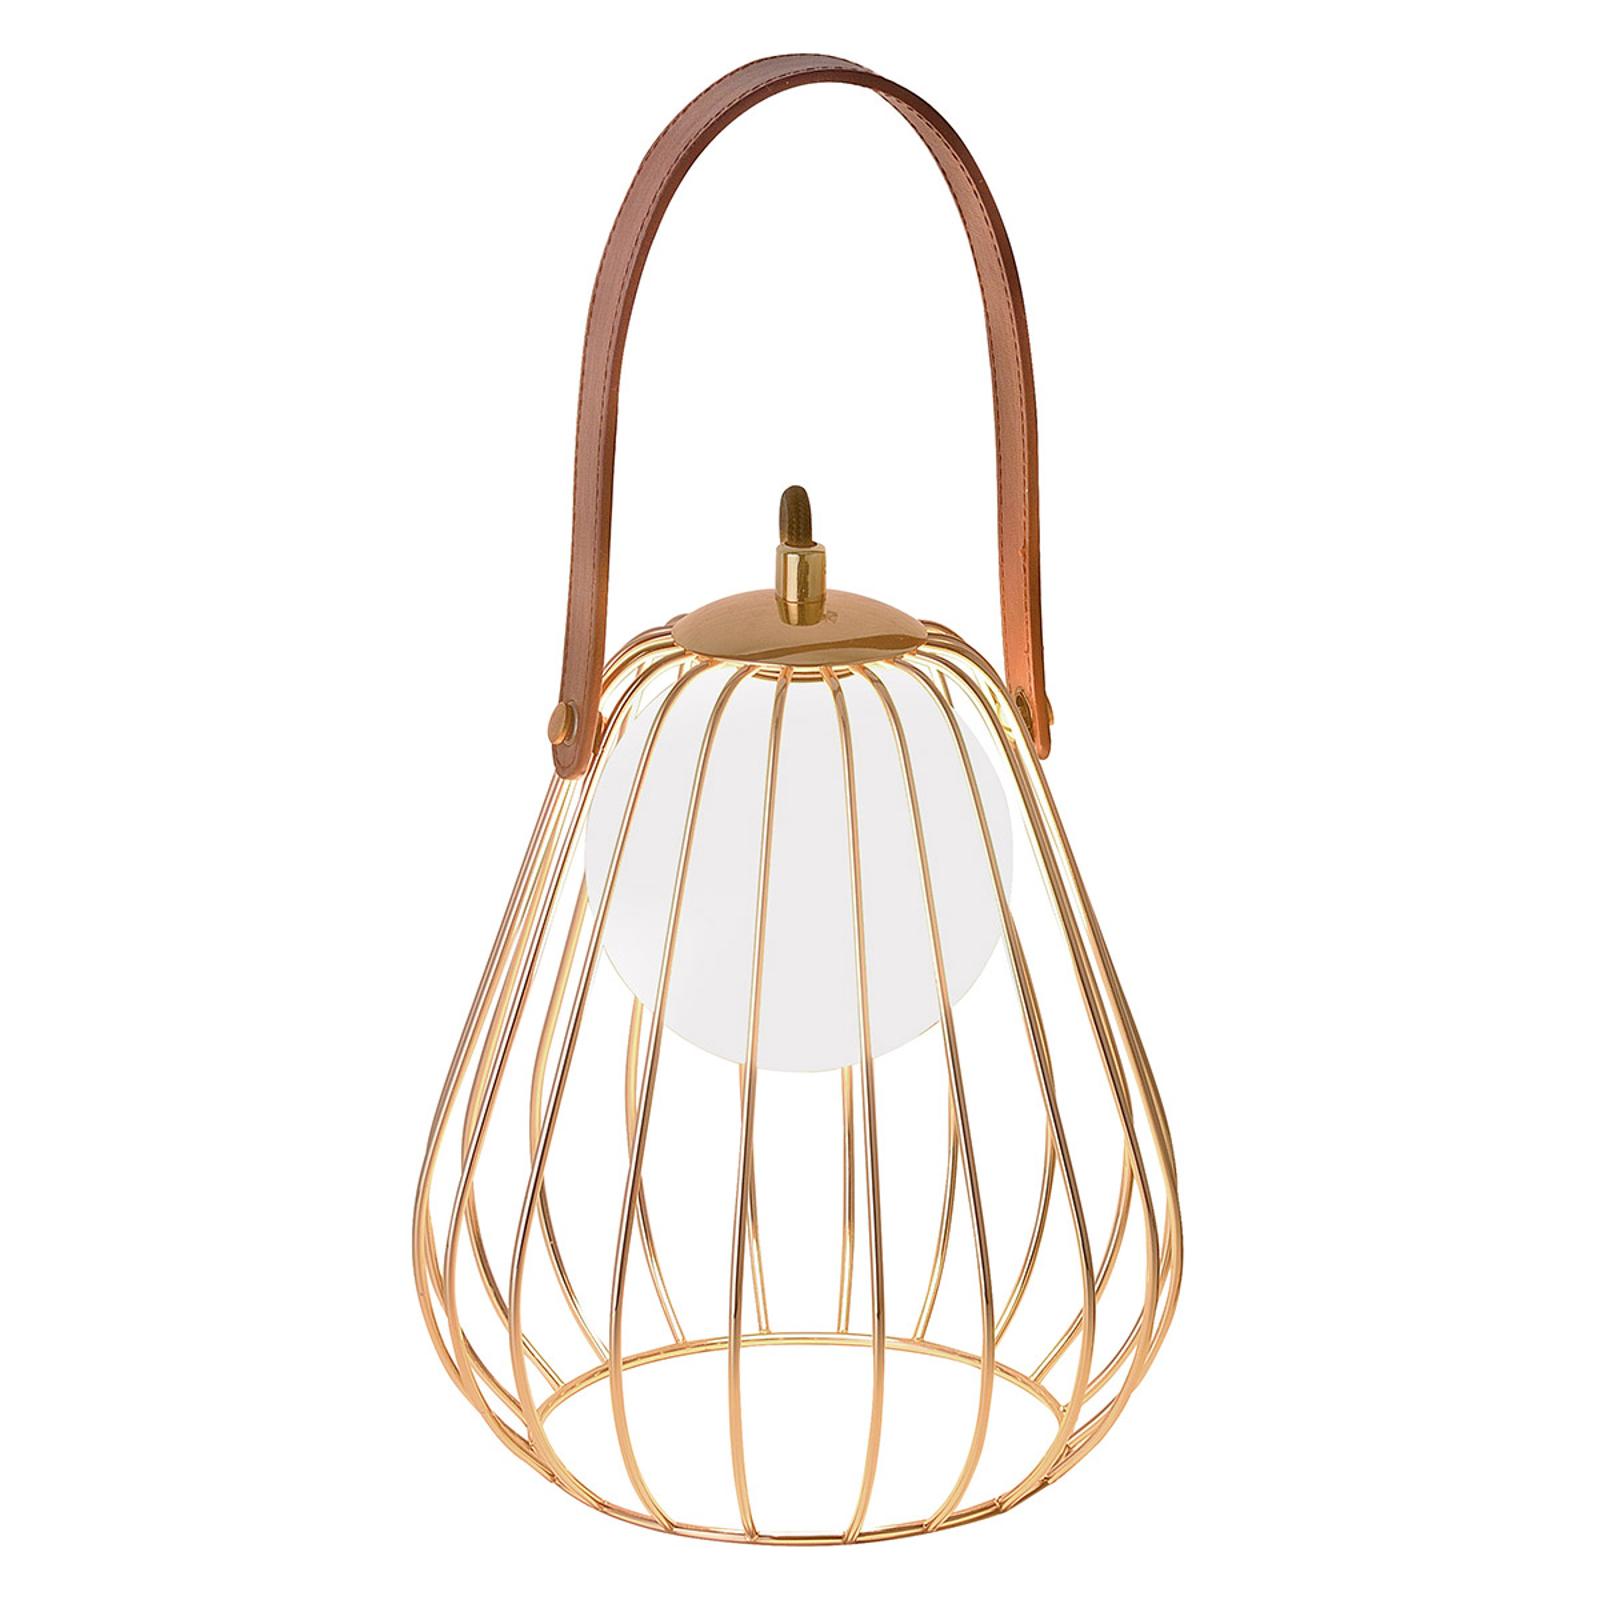 Tafellamp Levik met gouden kooi